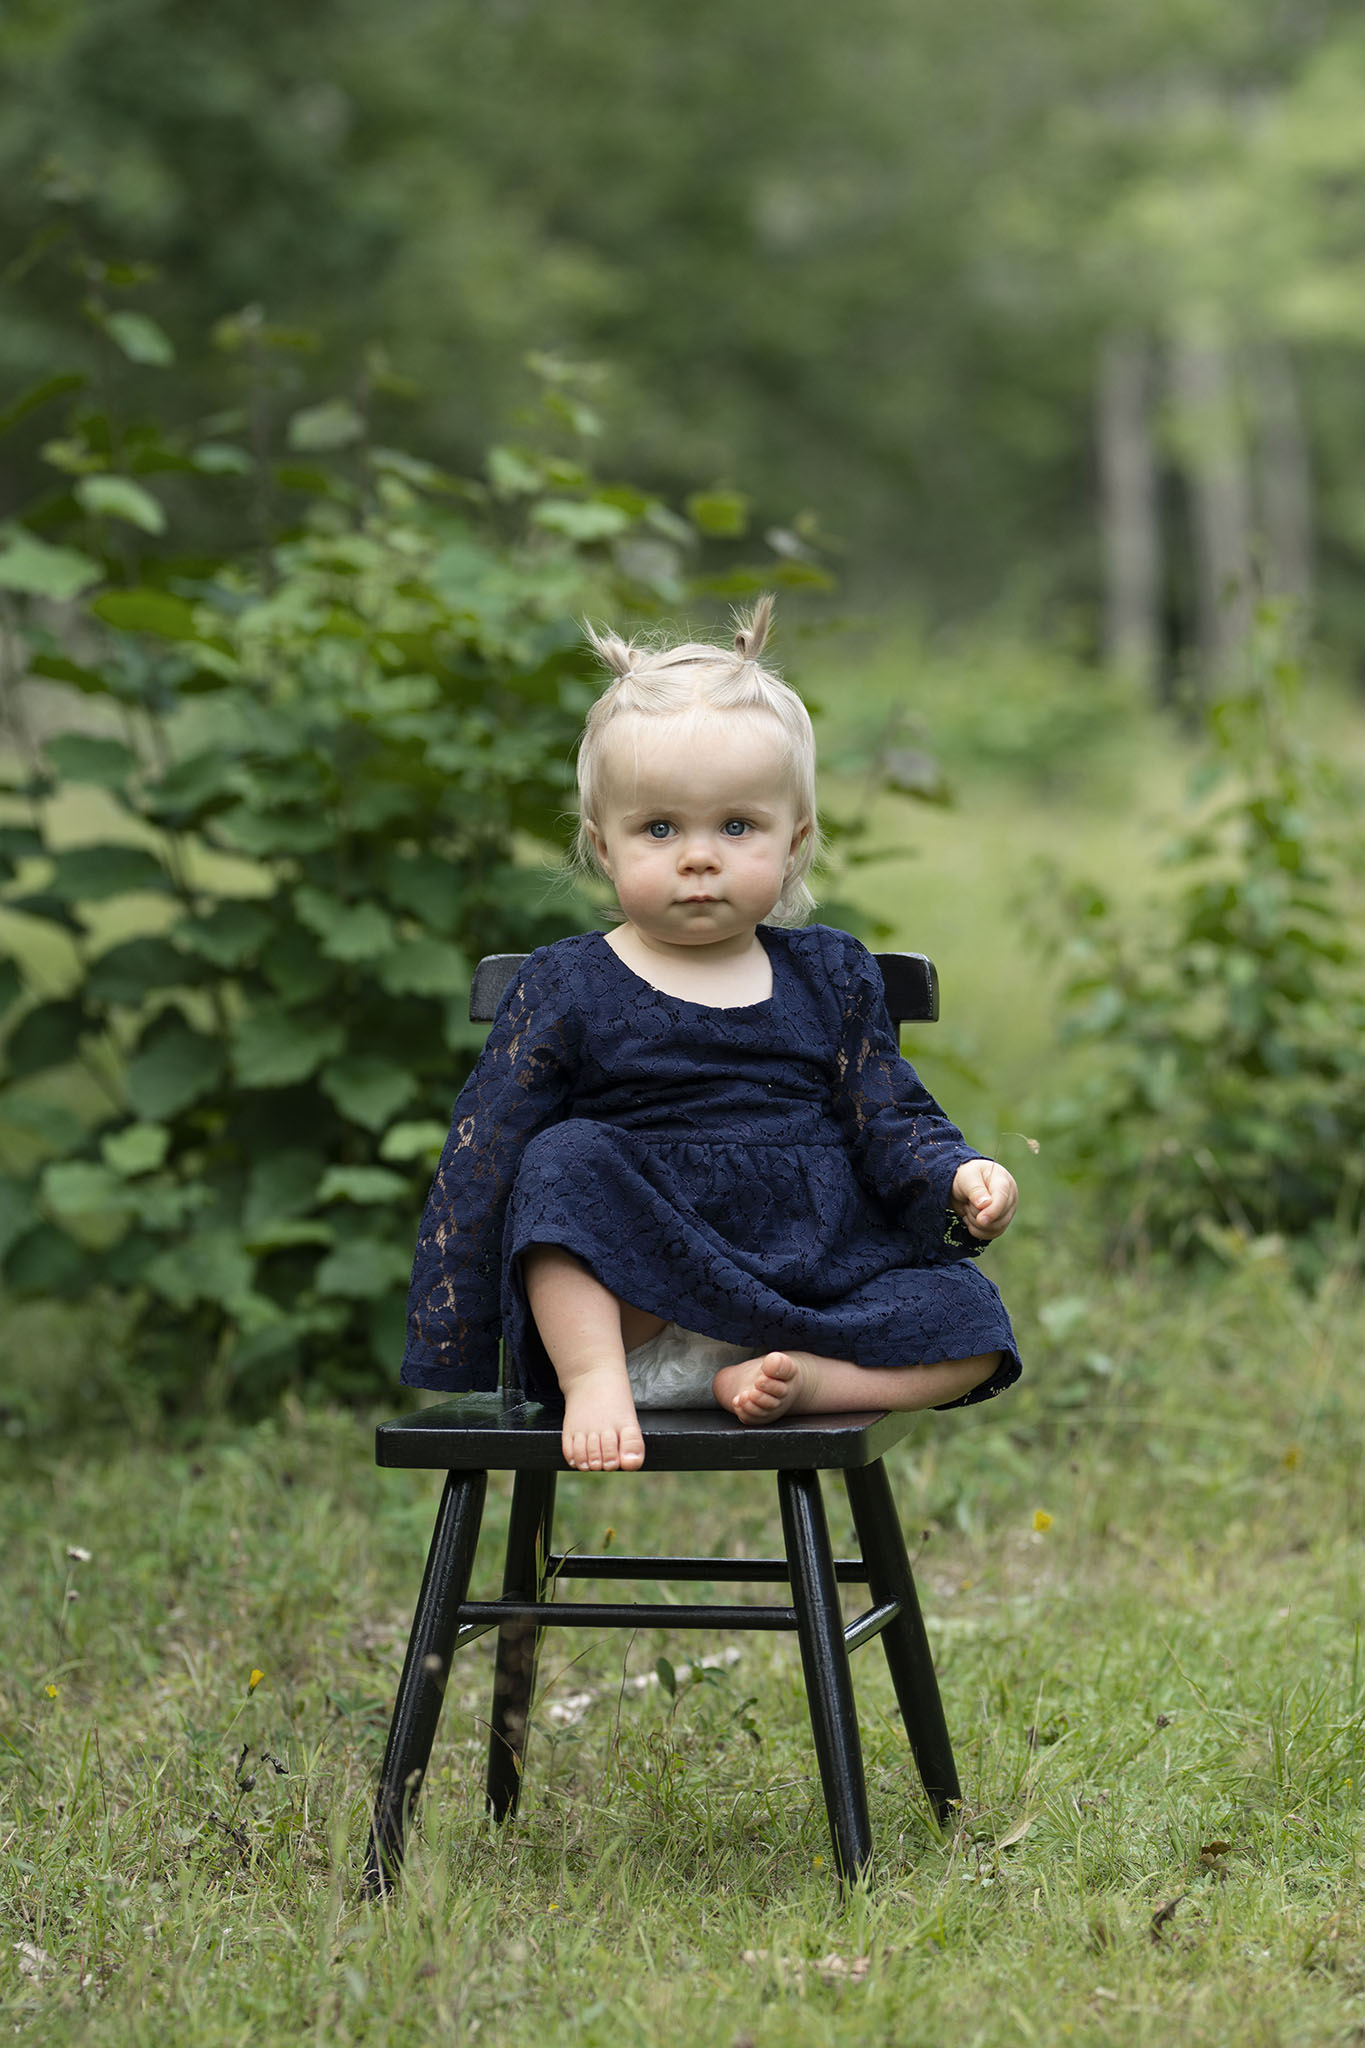 smpbarnsfotografering